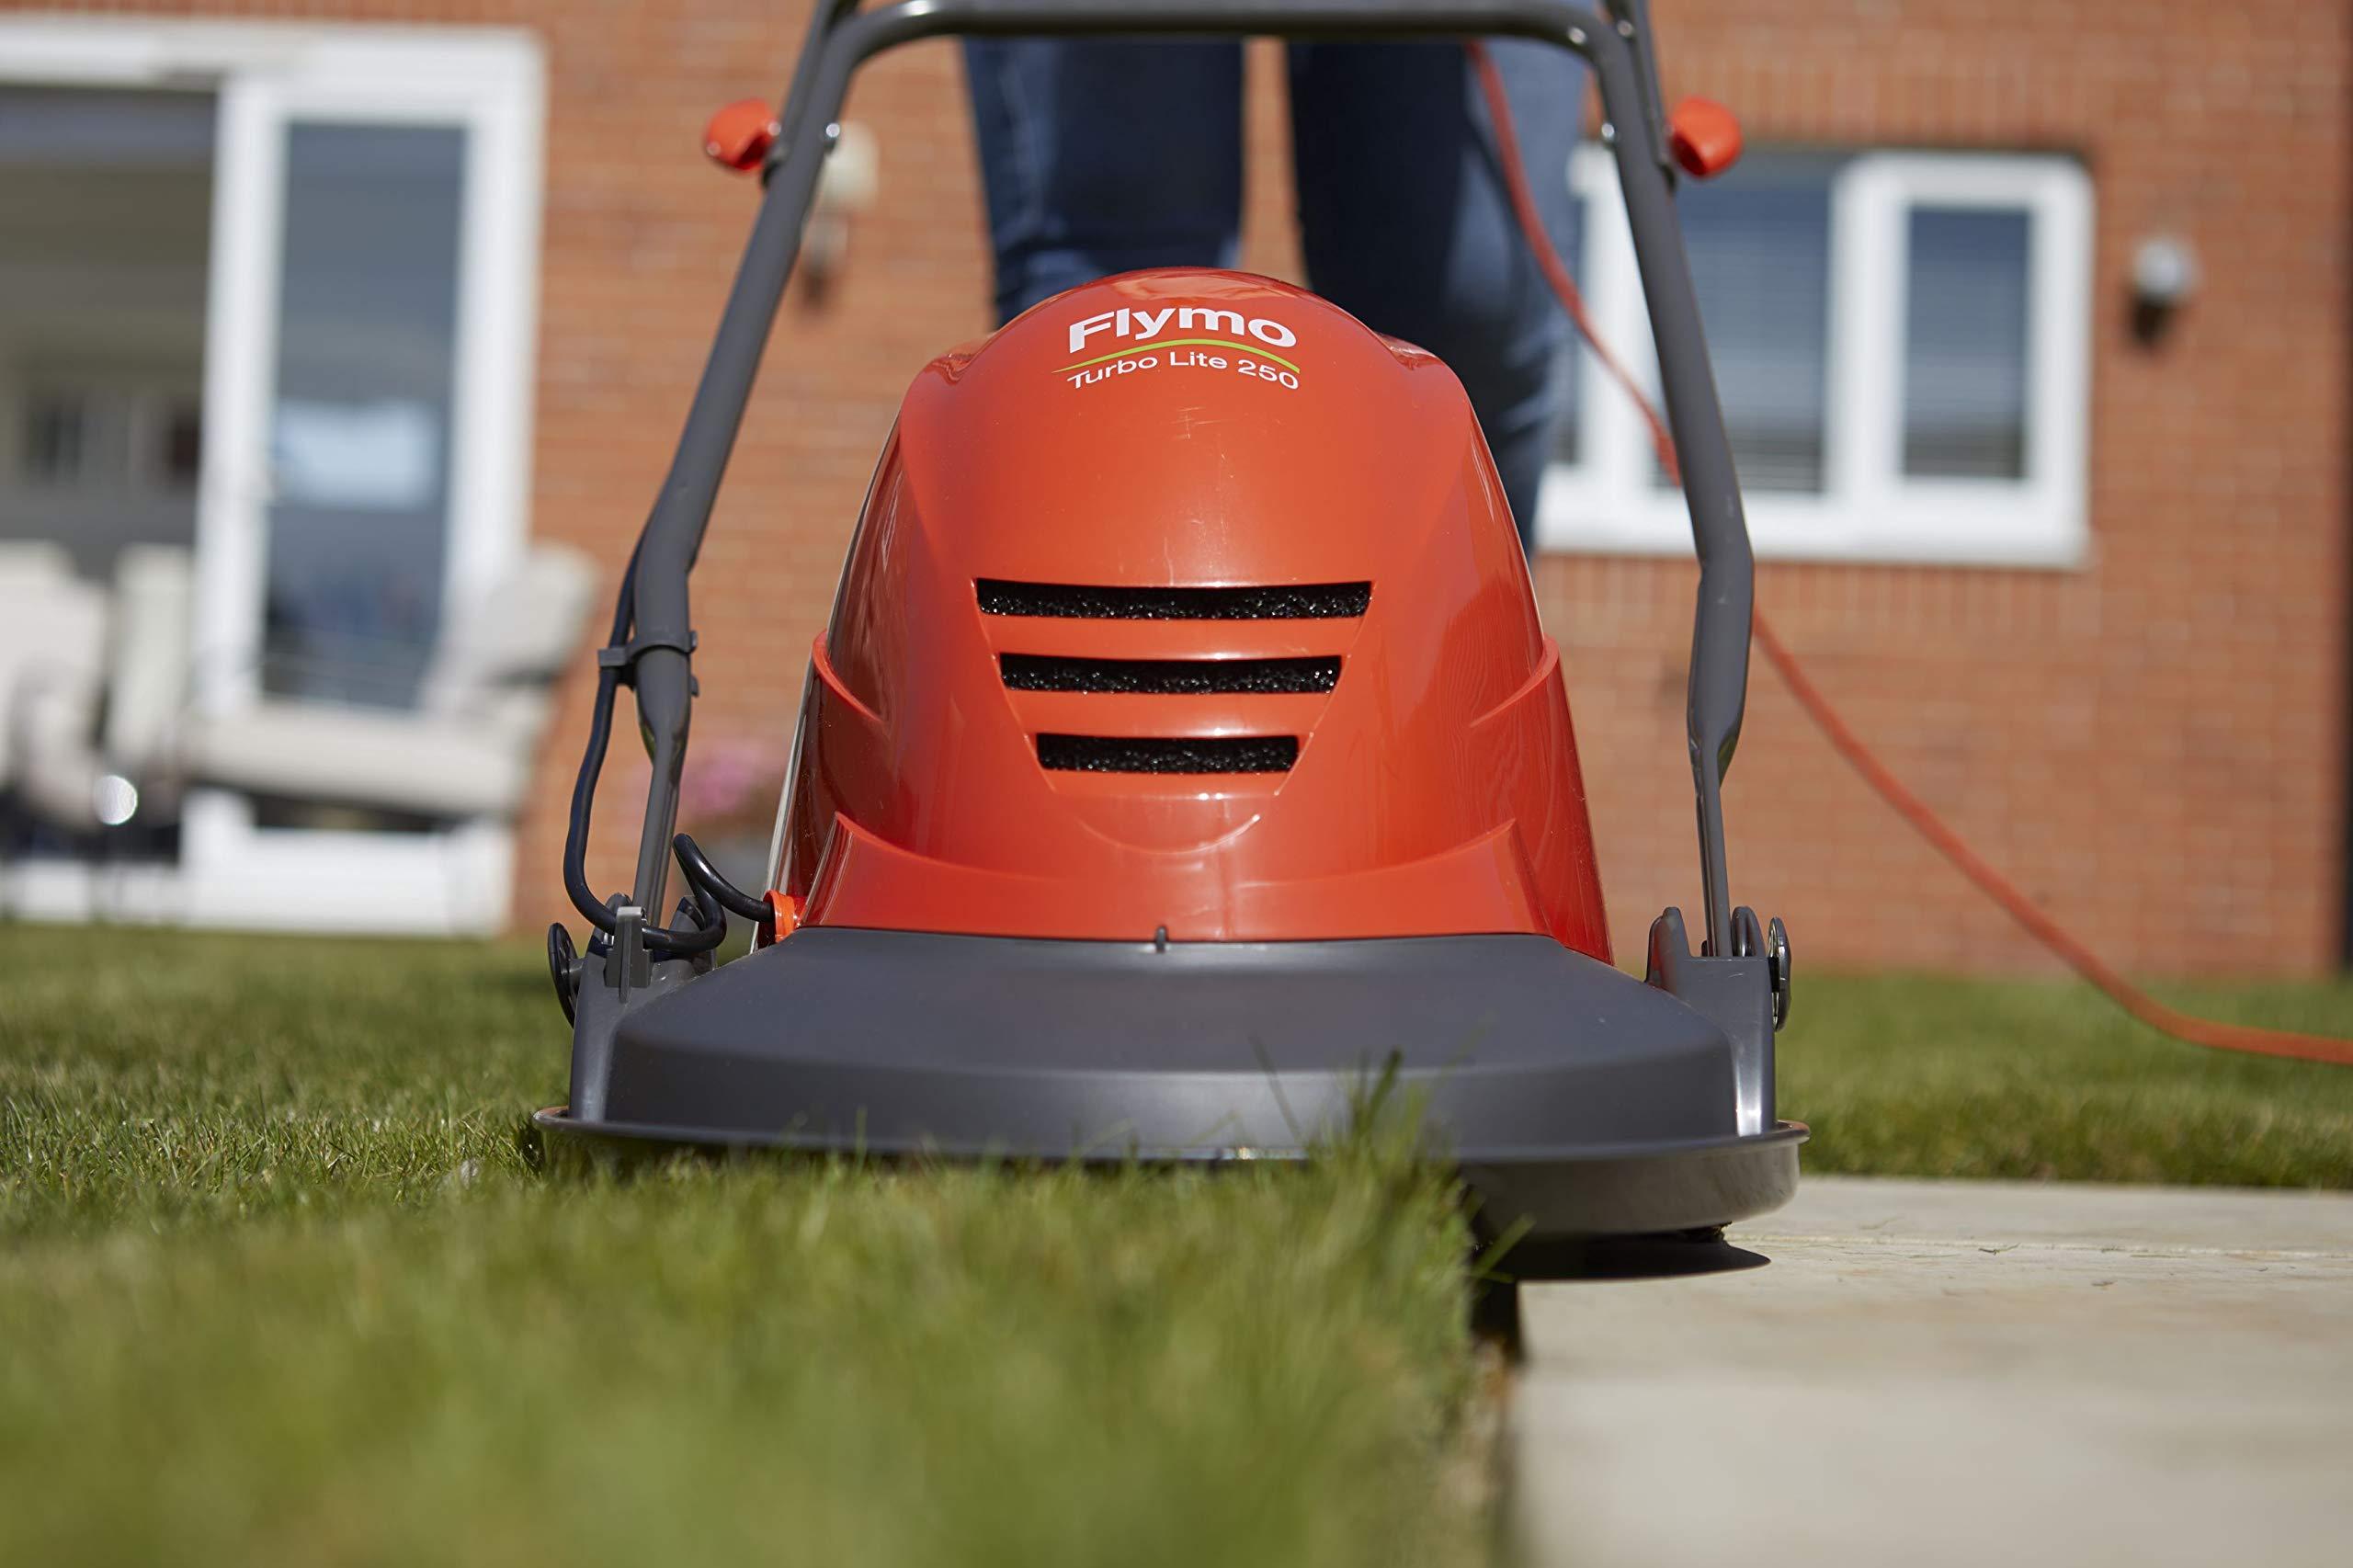 Flymo Turbo Lite 270 Electric Hover Lawn Mower Self-Mulching 27 cm Cutting Width 1400 W